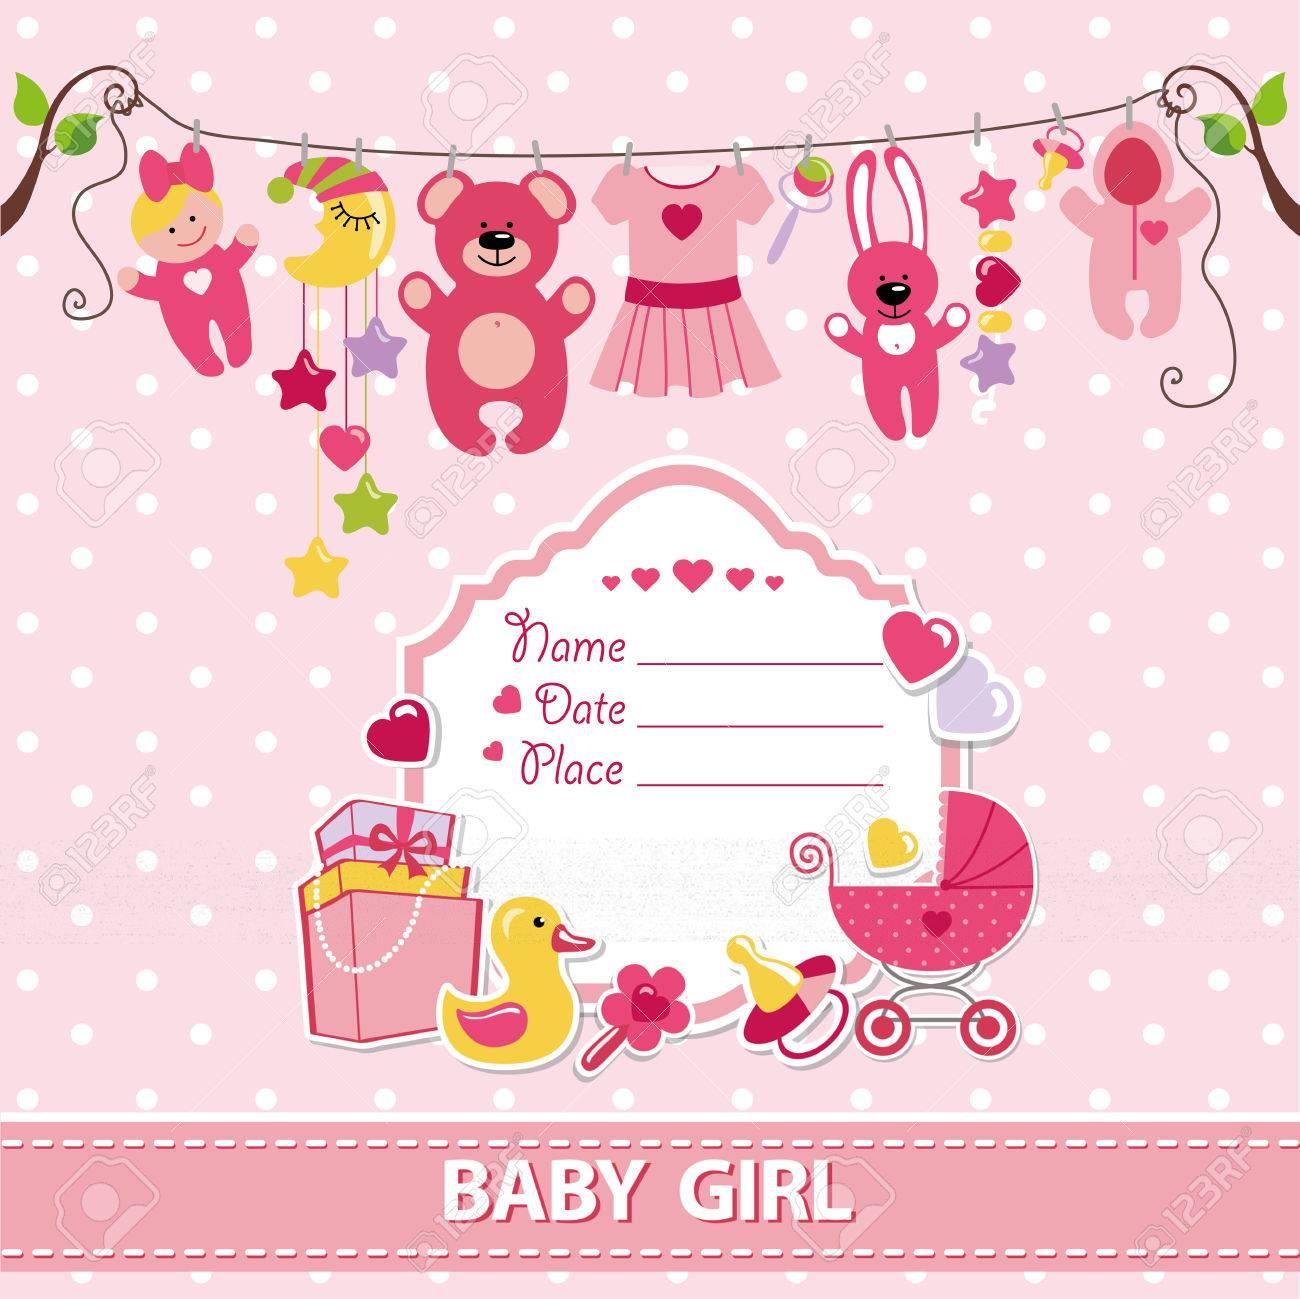 new born baby girl invitation shower cardflat elements hanging on ropelabel